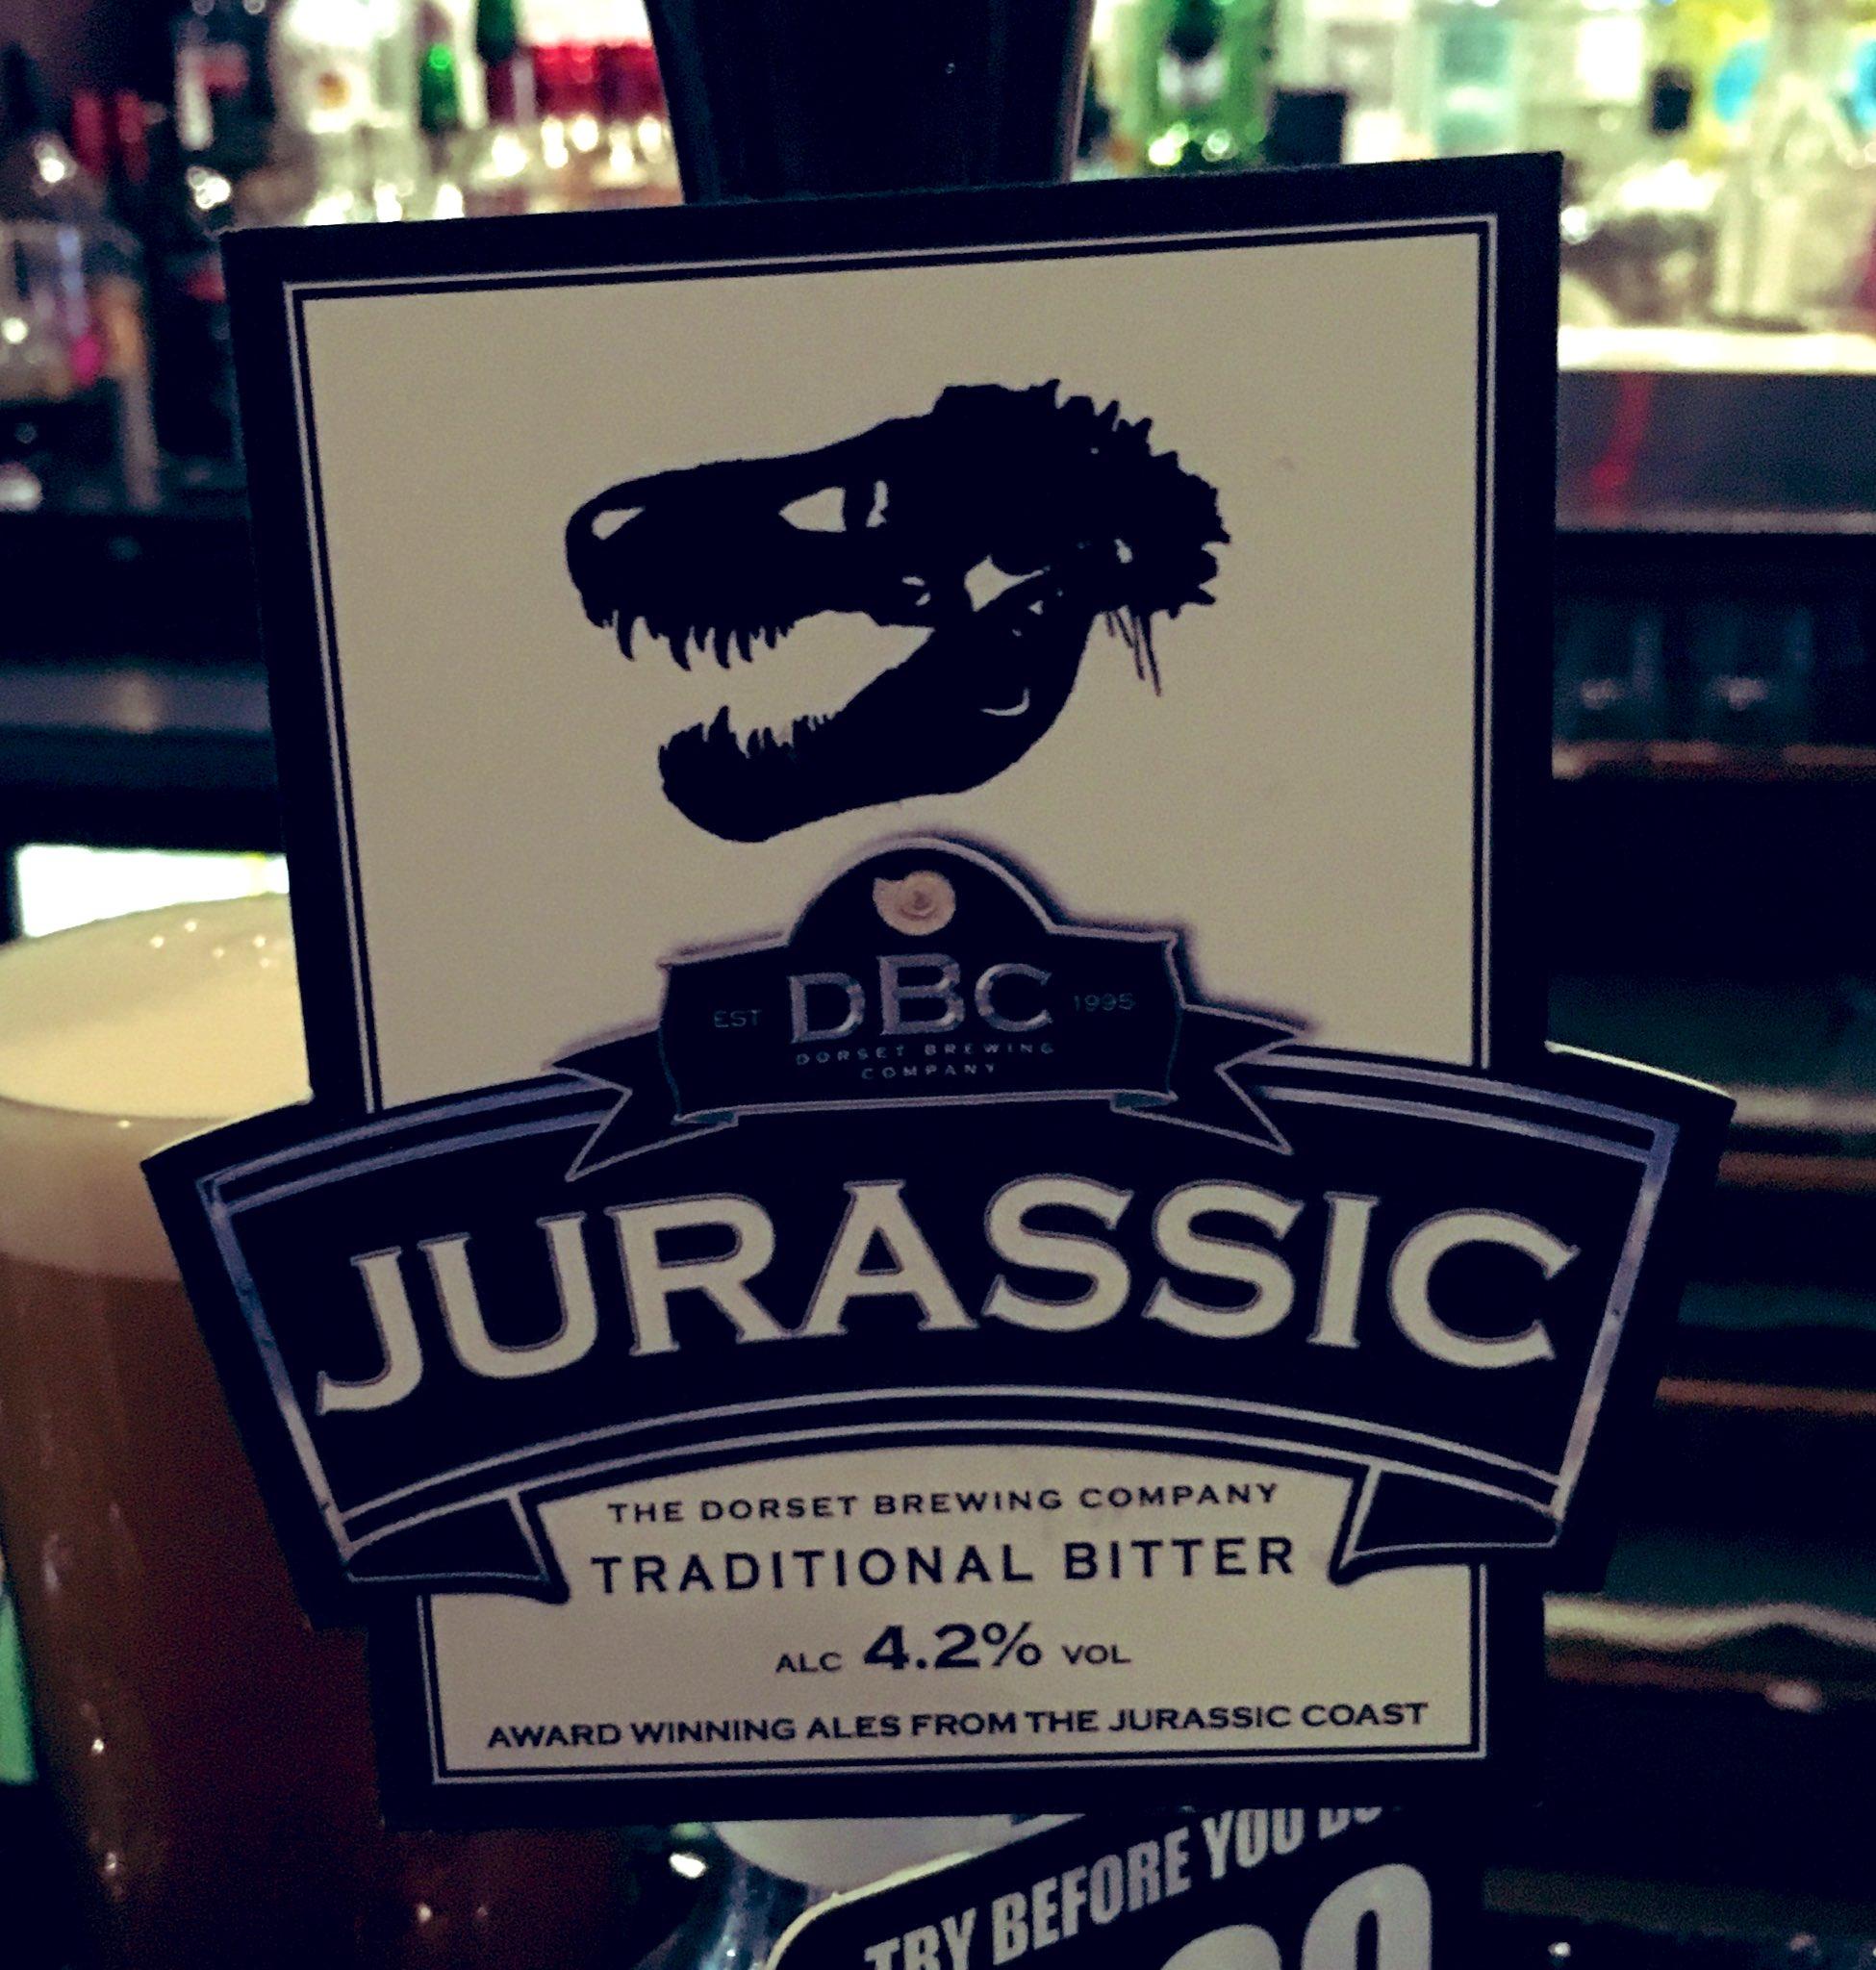 184: Jurassic